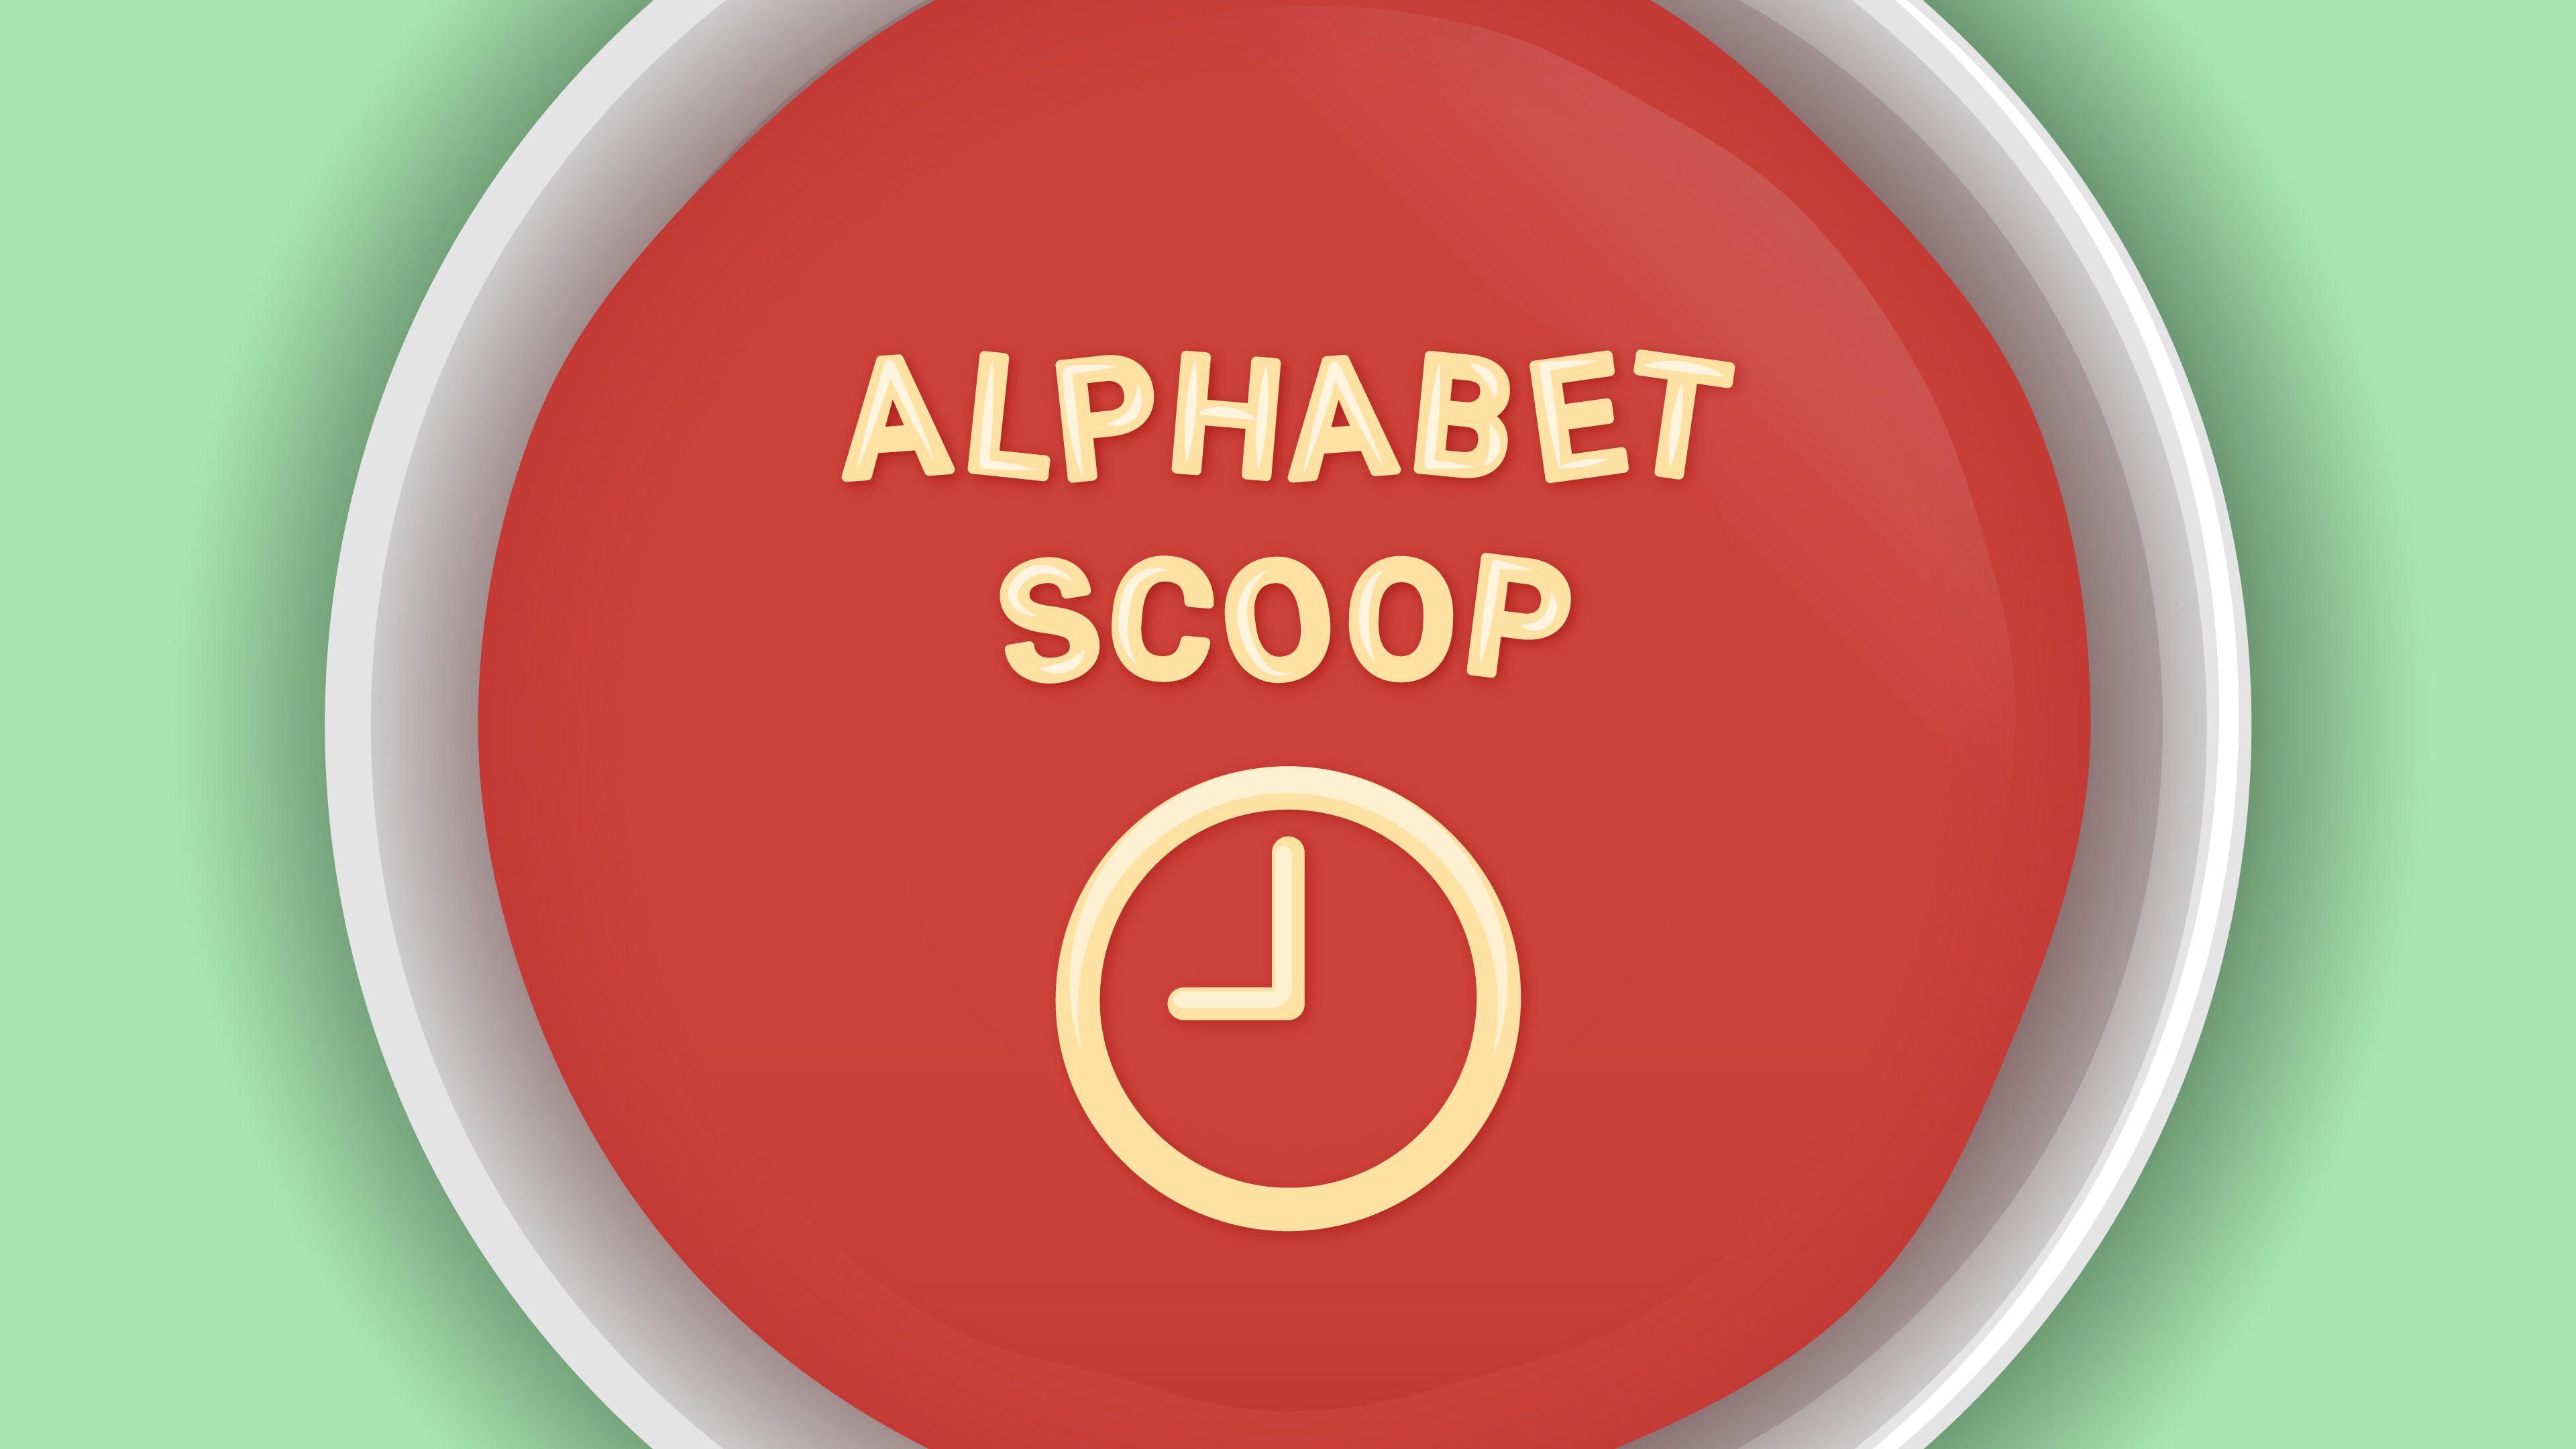 Alphabet Scoop 043: Surprise GDC Google event, unpacking Samsung, MWC expectations